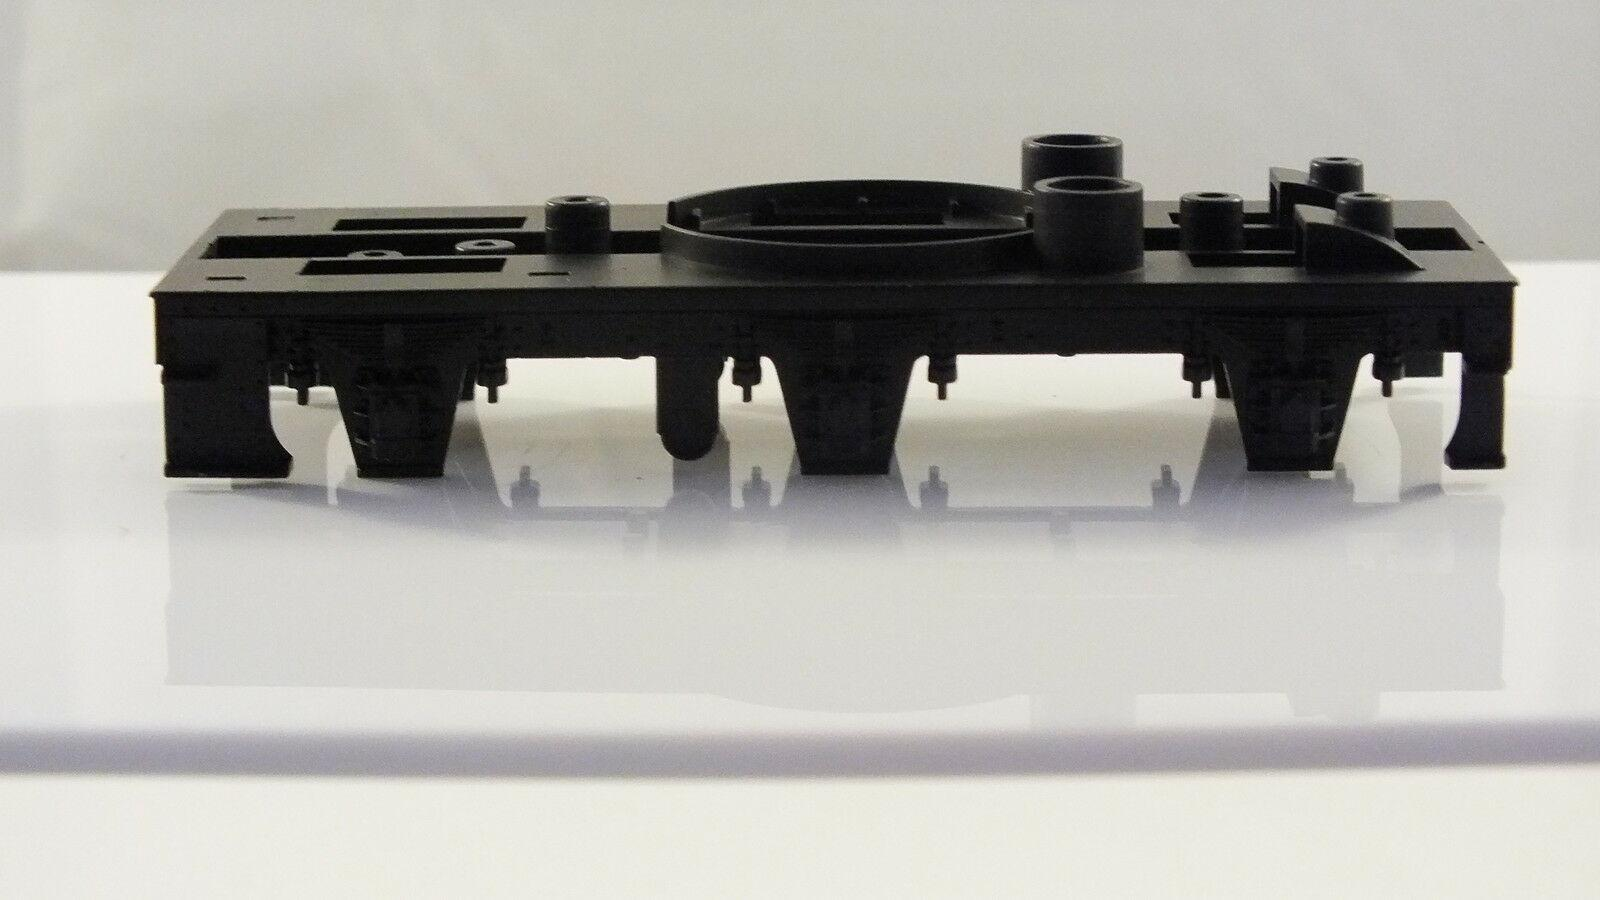 X6207  # HORNBY TRIANG TENDER FRAME  CLASS 2800/3800      S9C